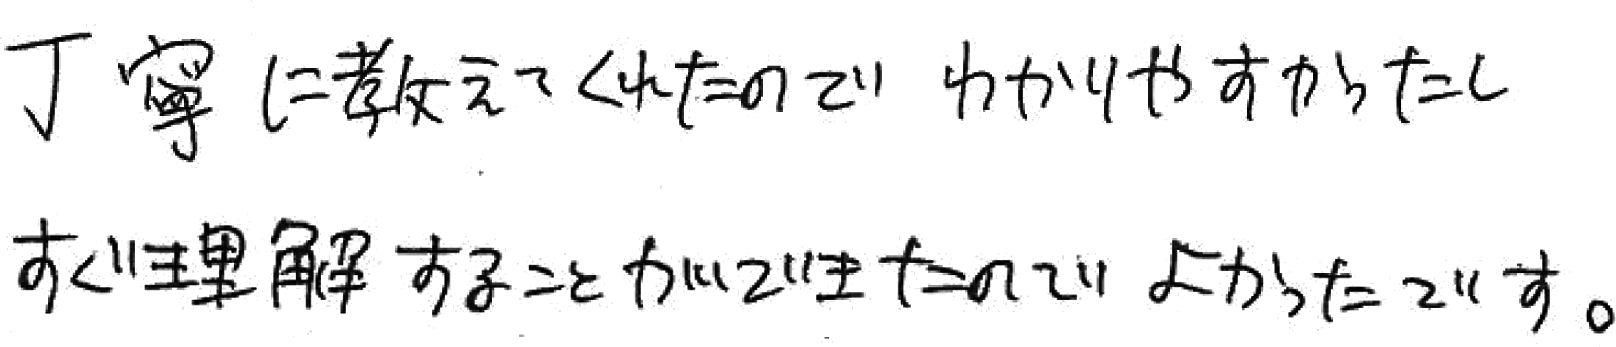 Kちゃん(七尾市)からの口コミ